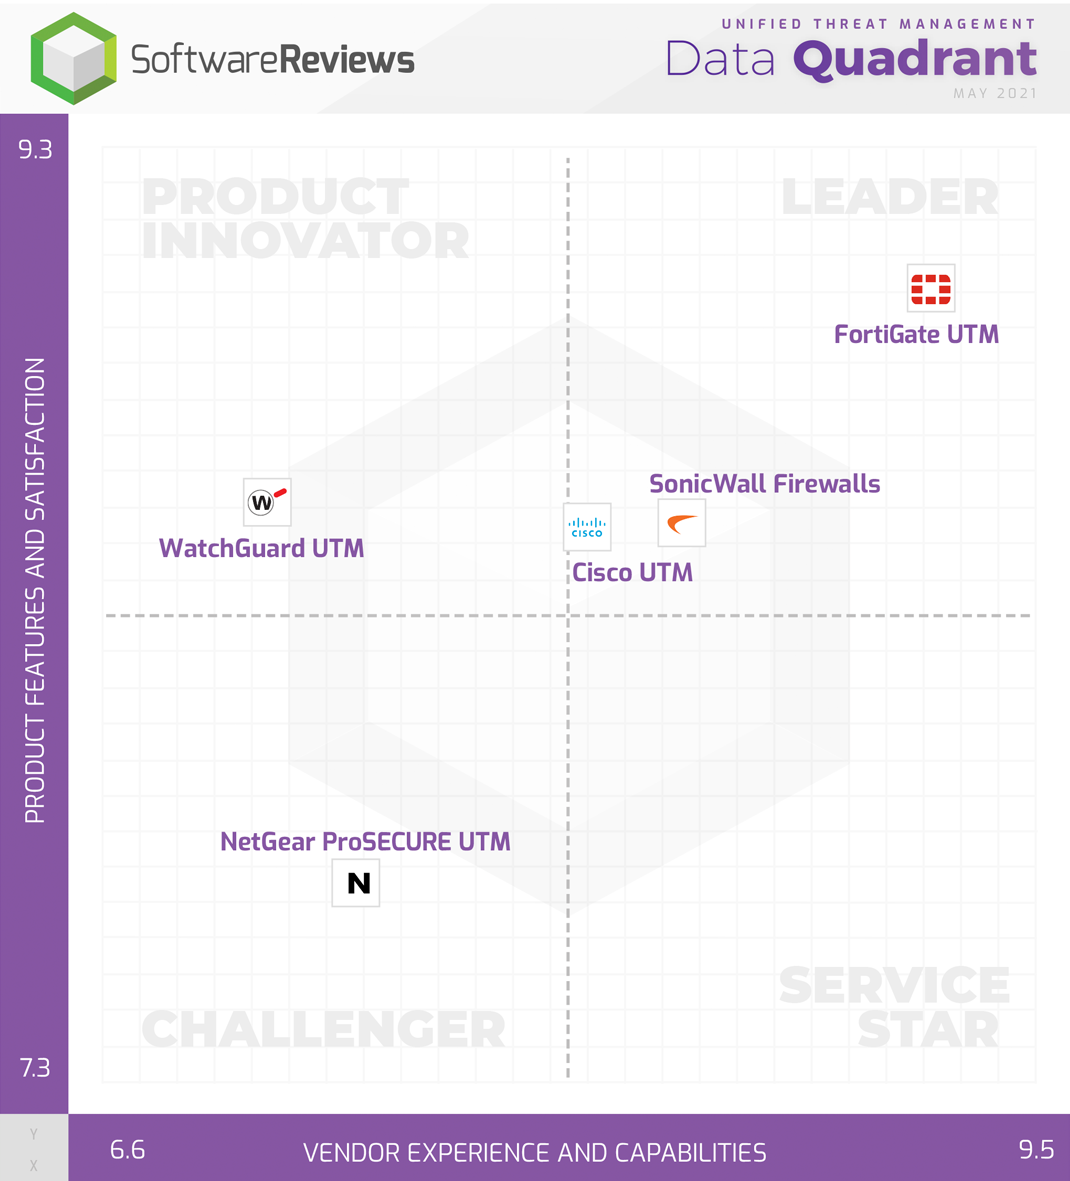 Unified Threat Management Data Quadrant